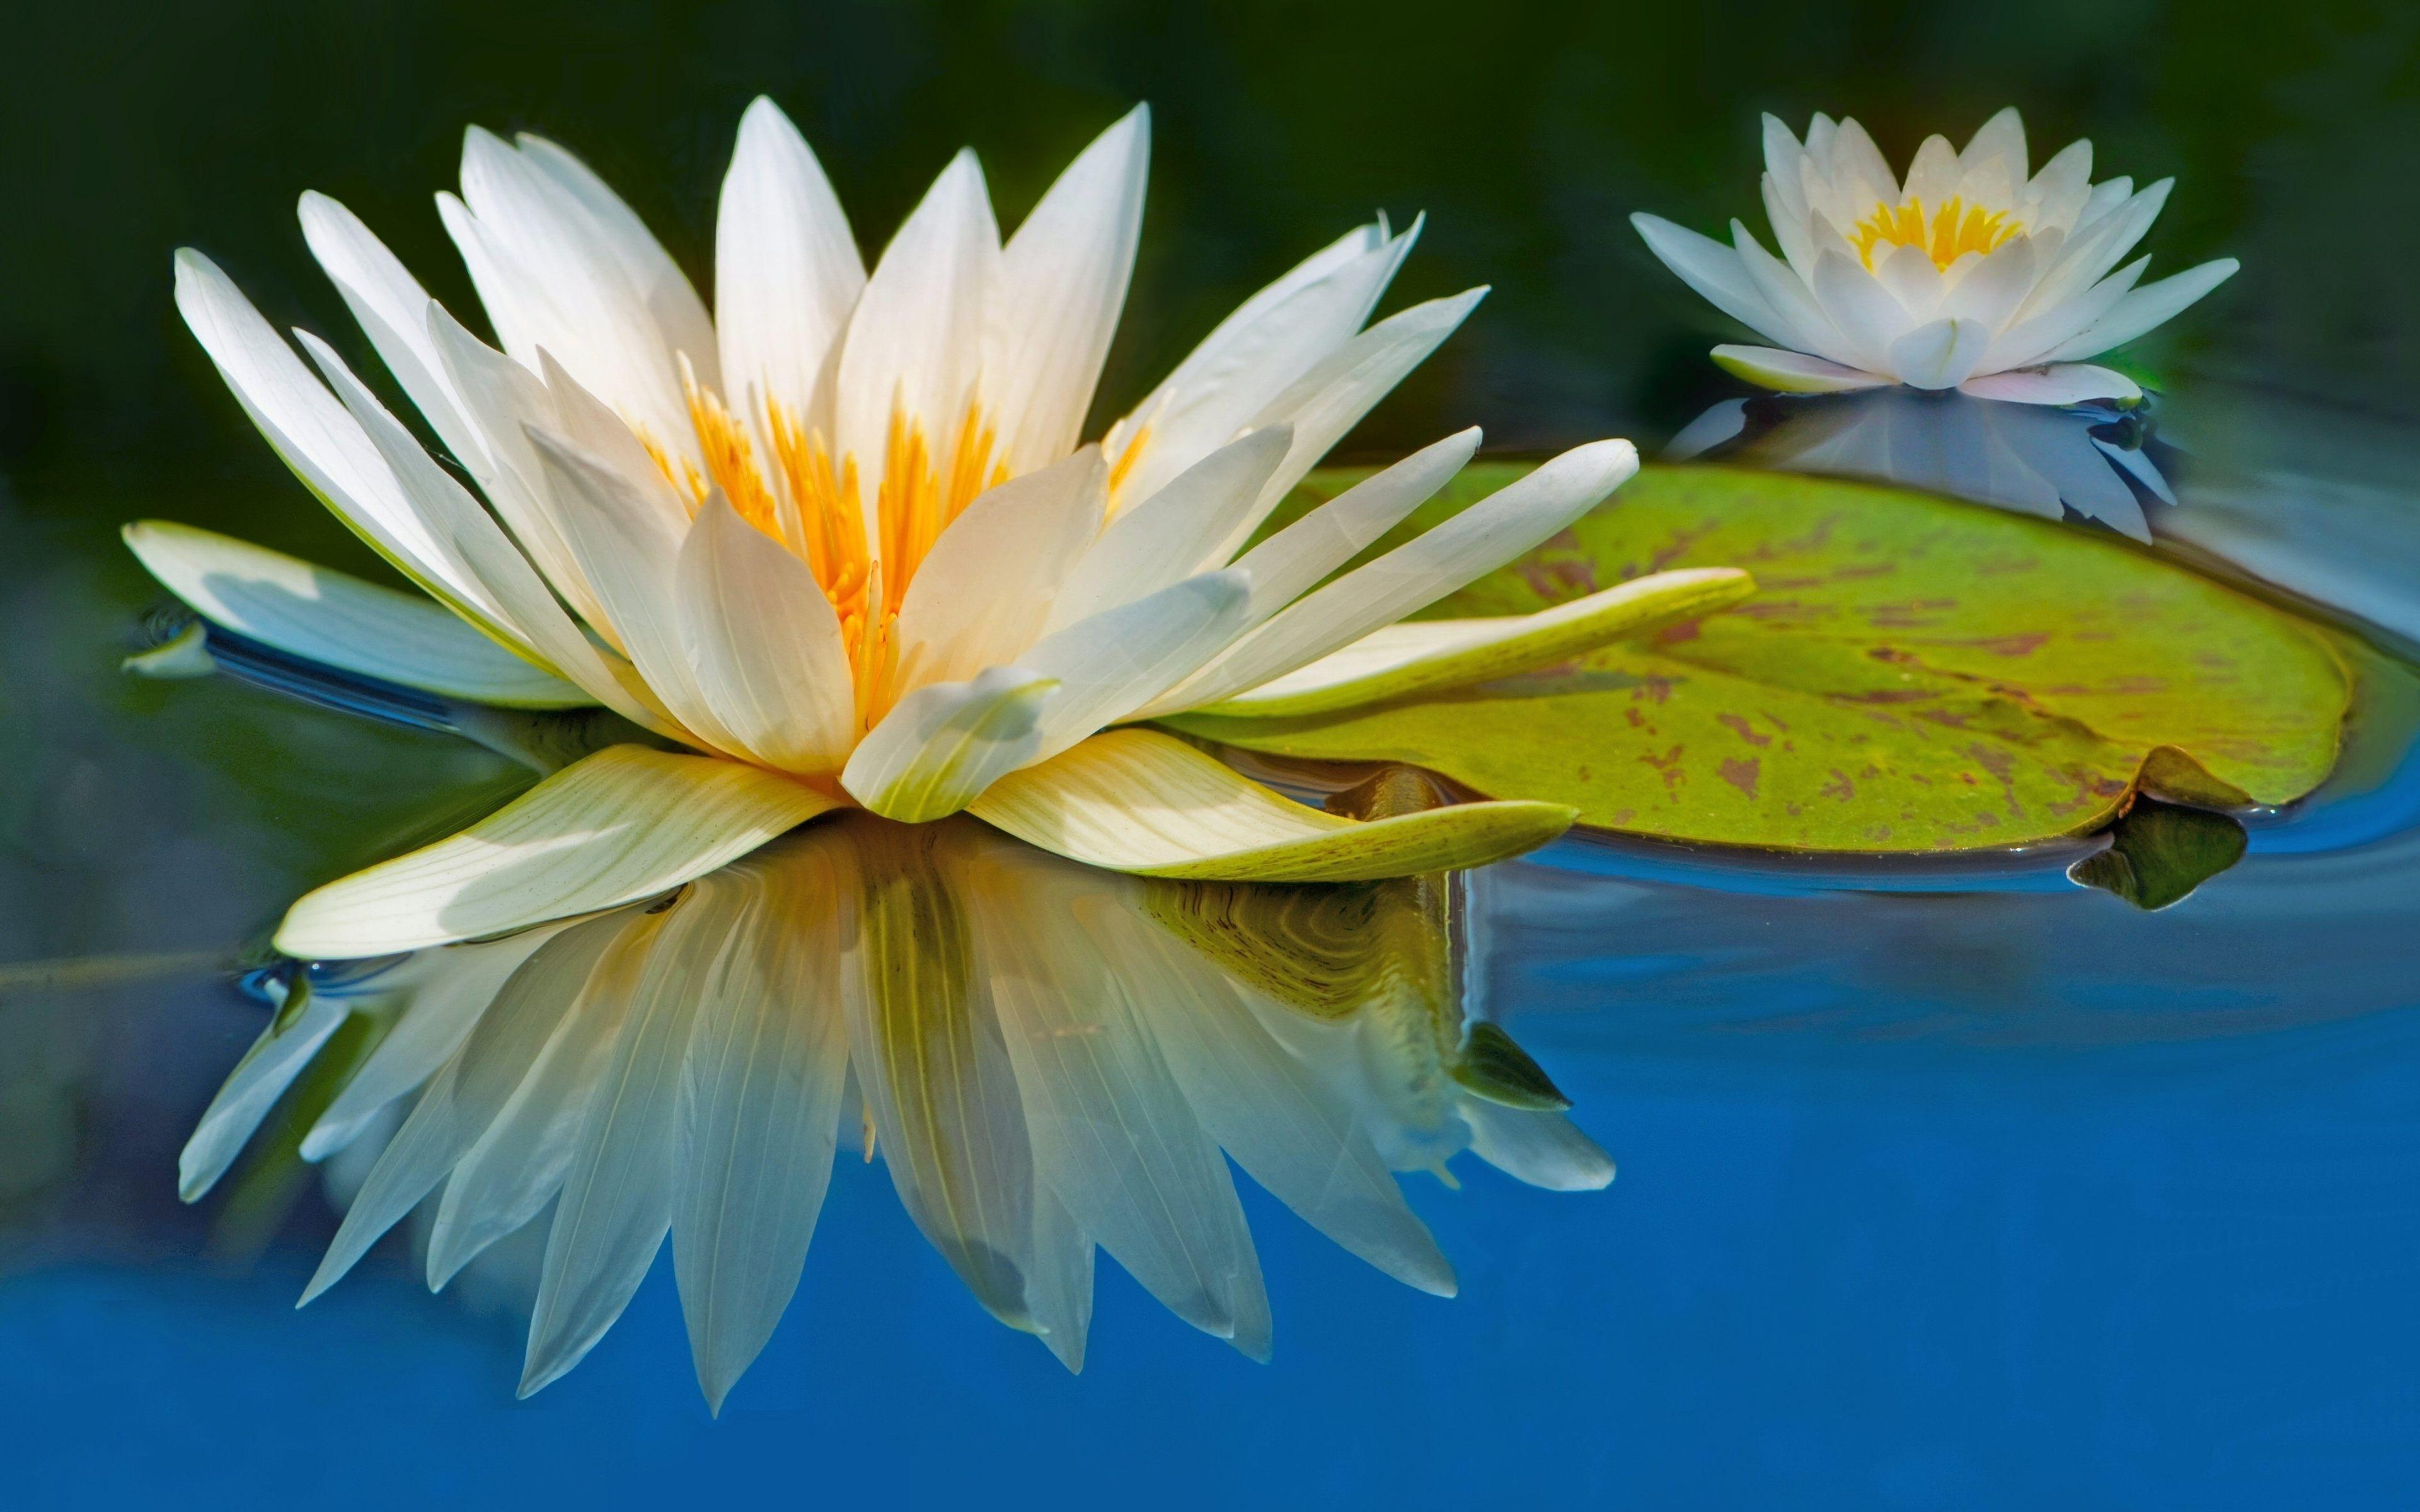 White Lotus Flower 4k Ultra Hd Wallpaper White Lotus Flower